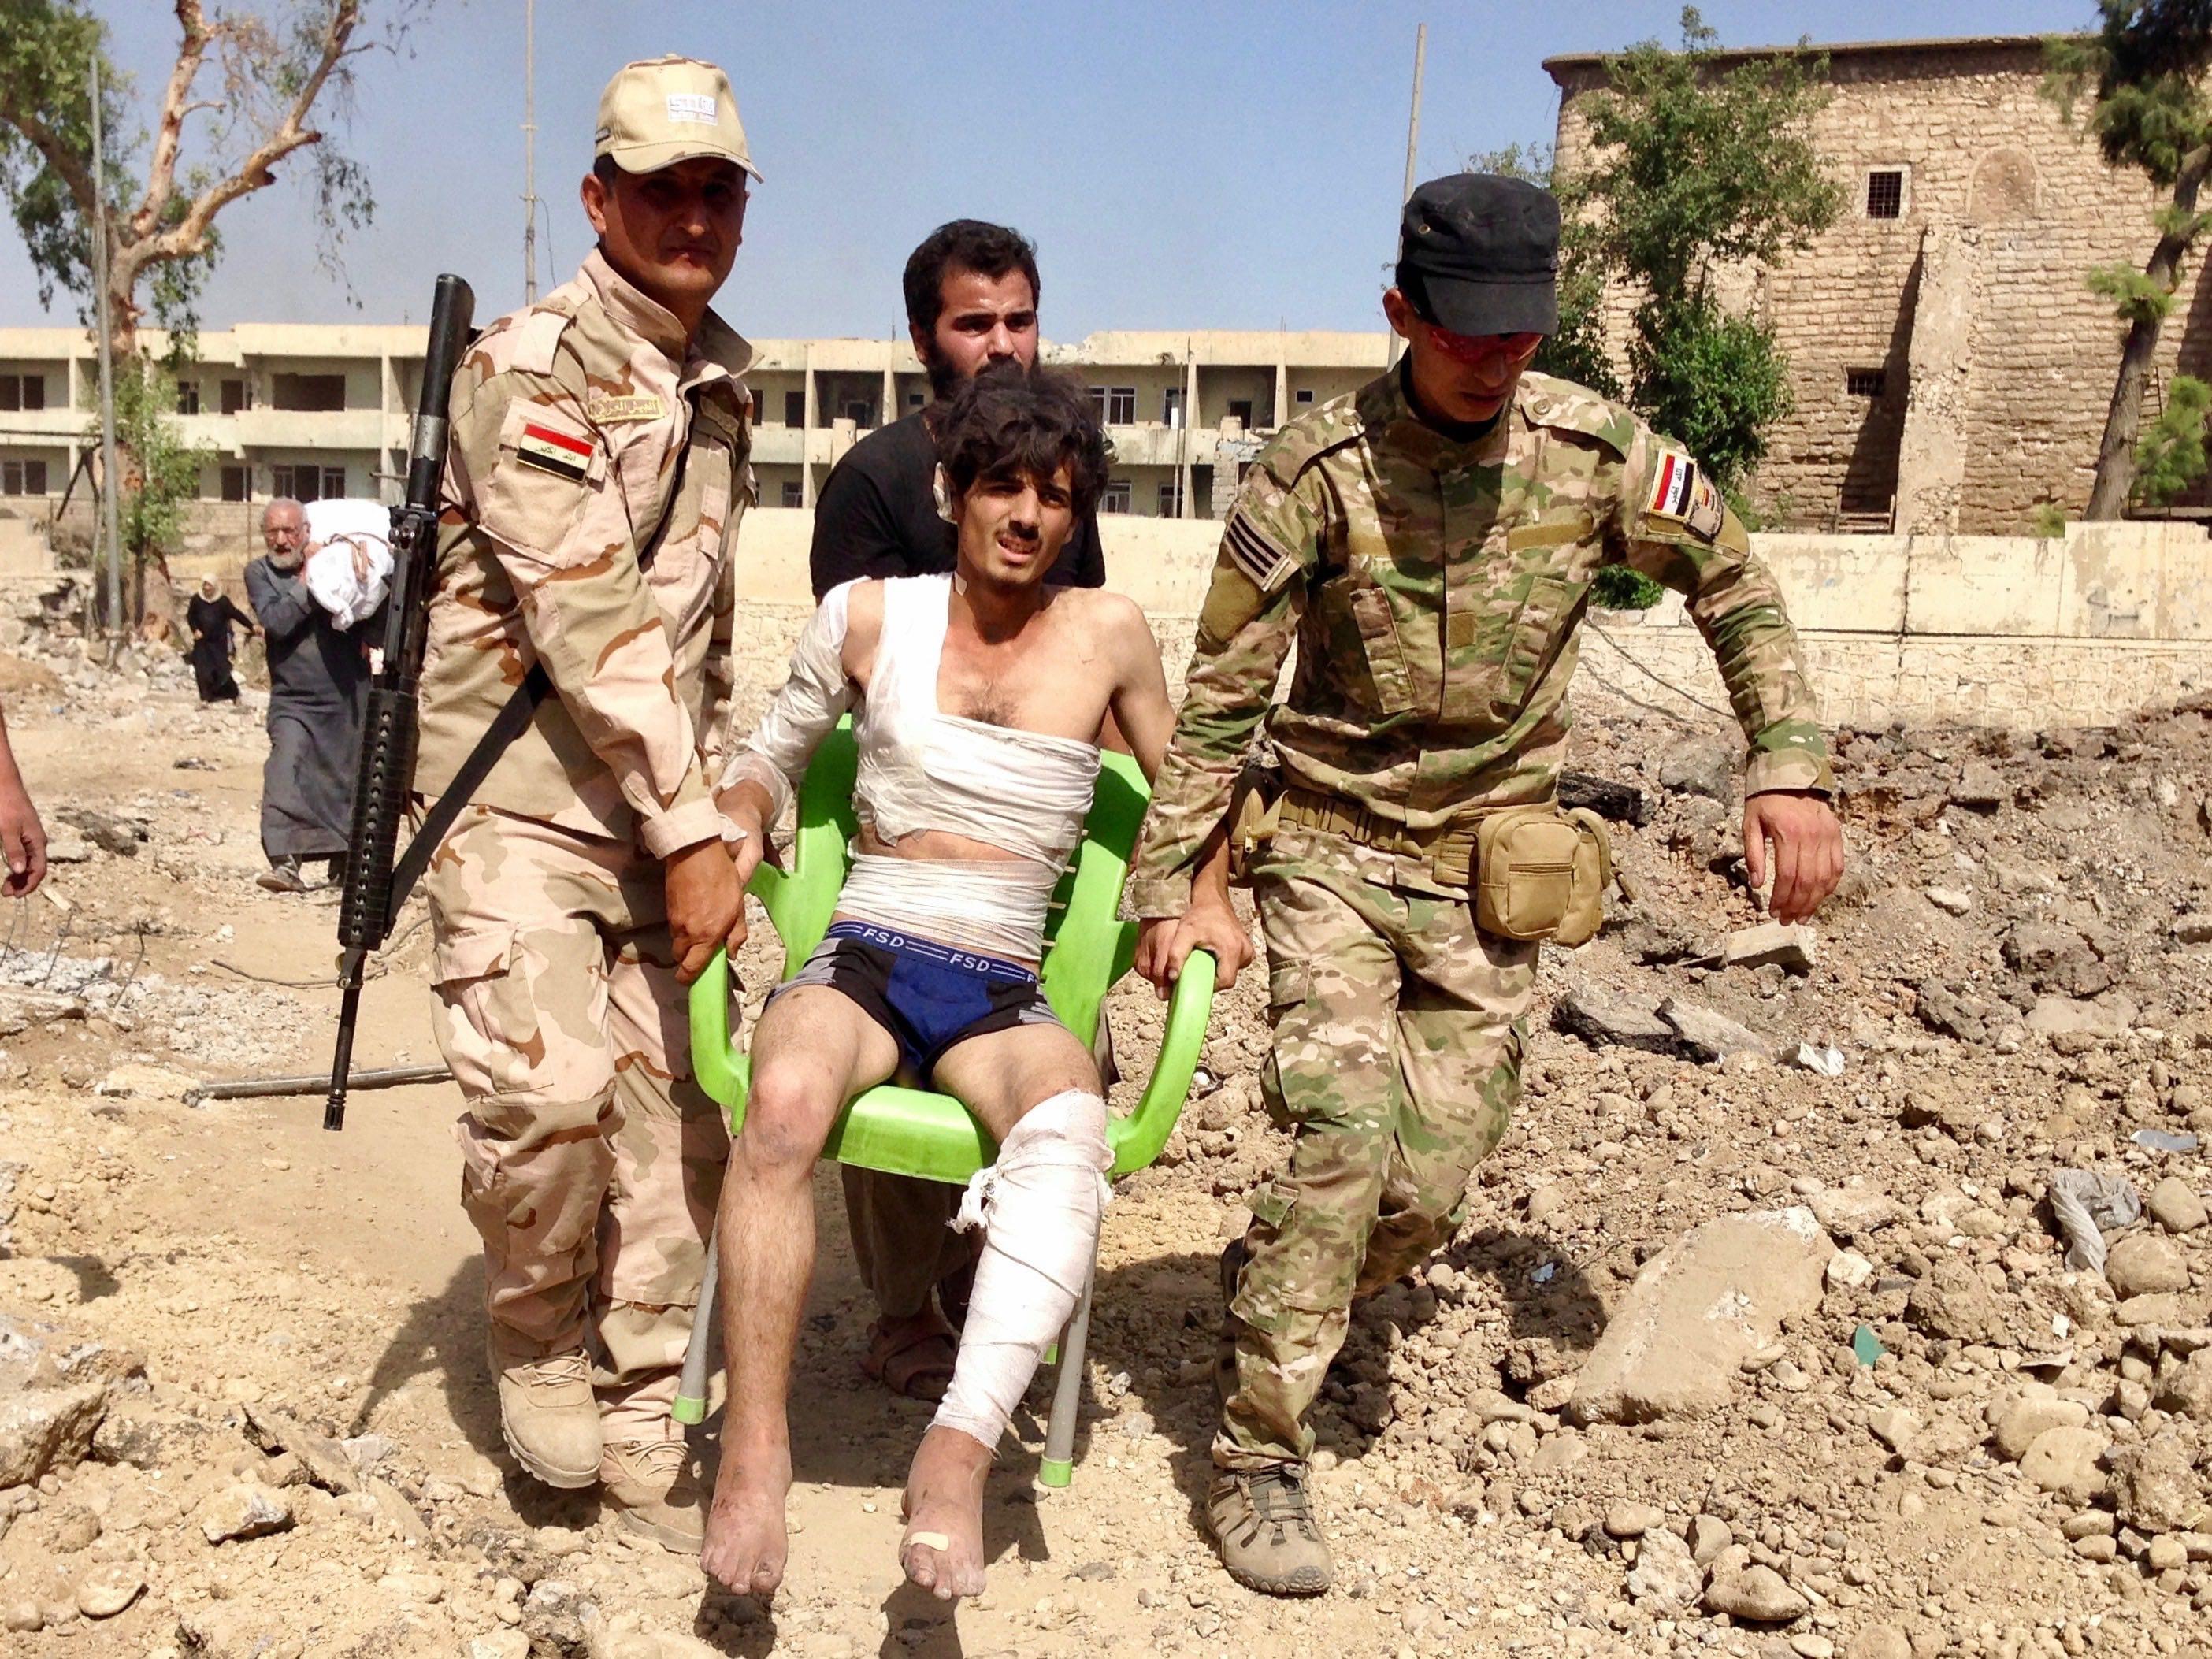 Saddam-era basement bunkers: A 'double-edged sword' for Mosul civilians